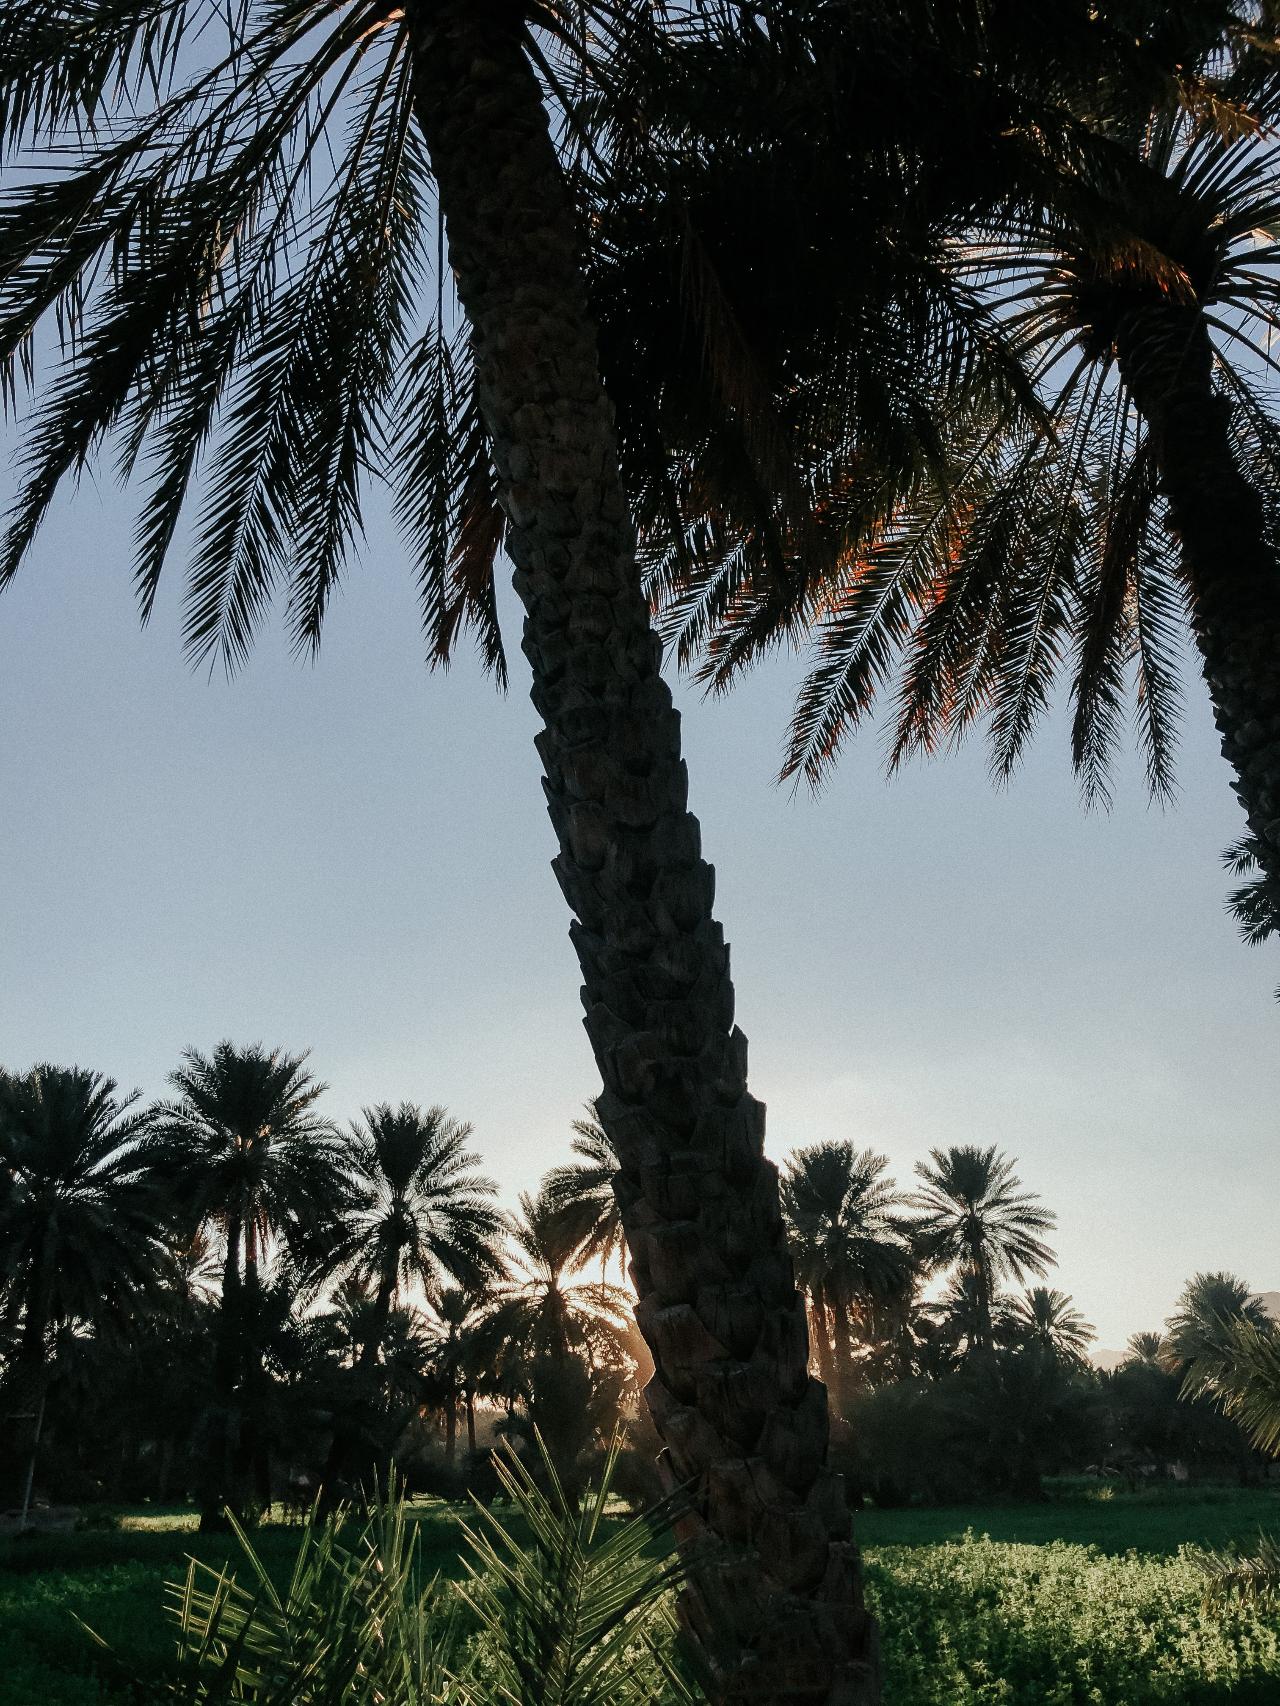 Photo 3: Palmeraie d'Al Hamra